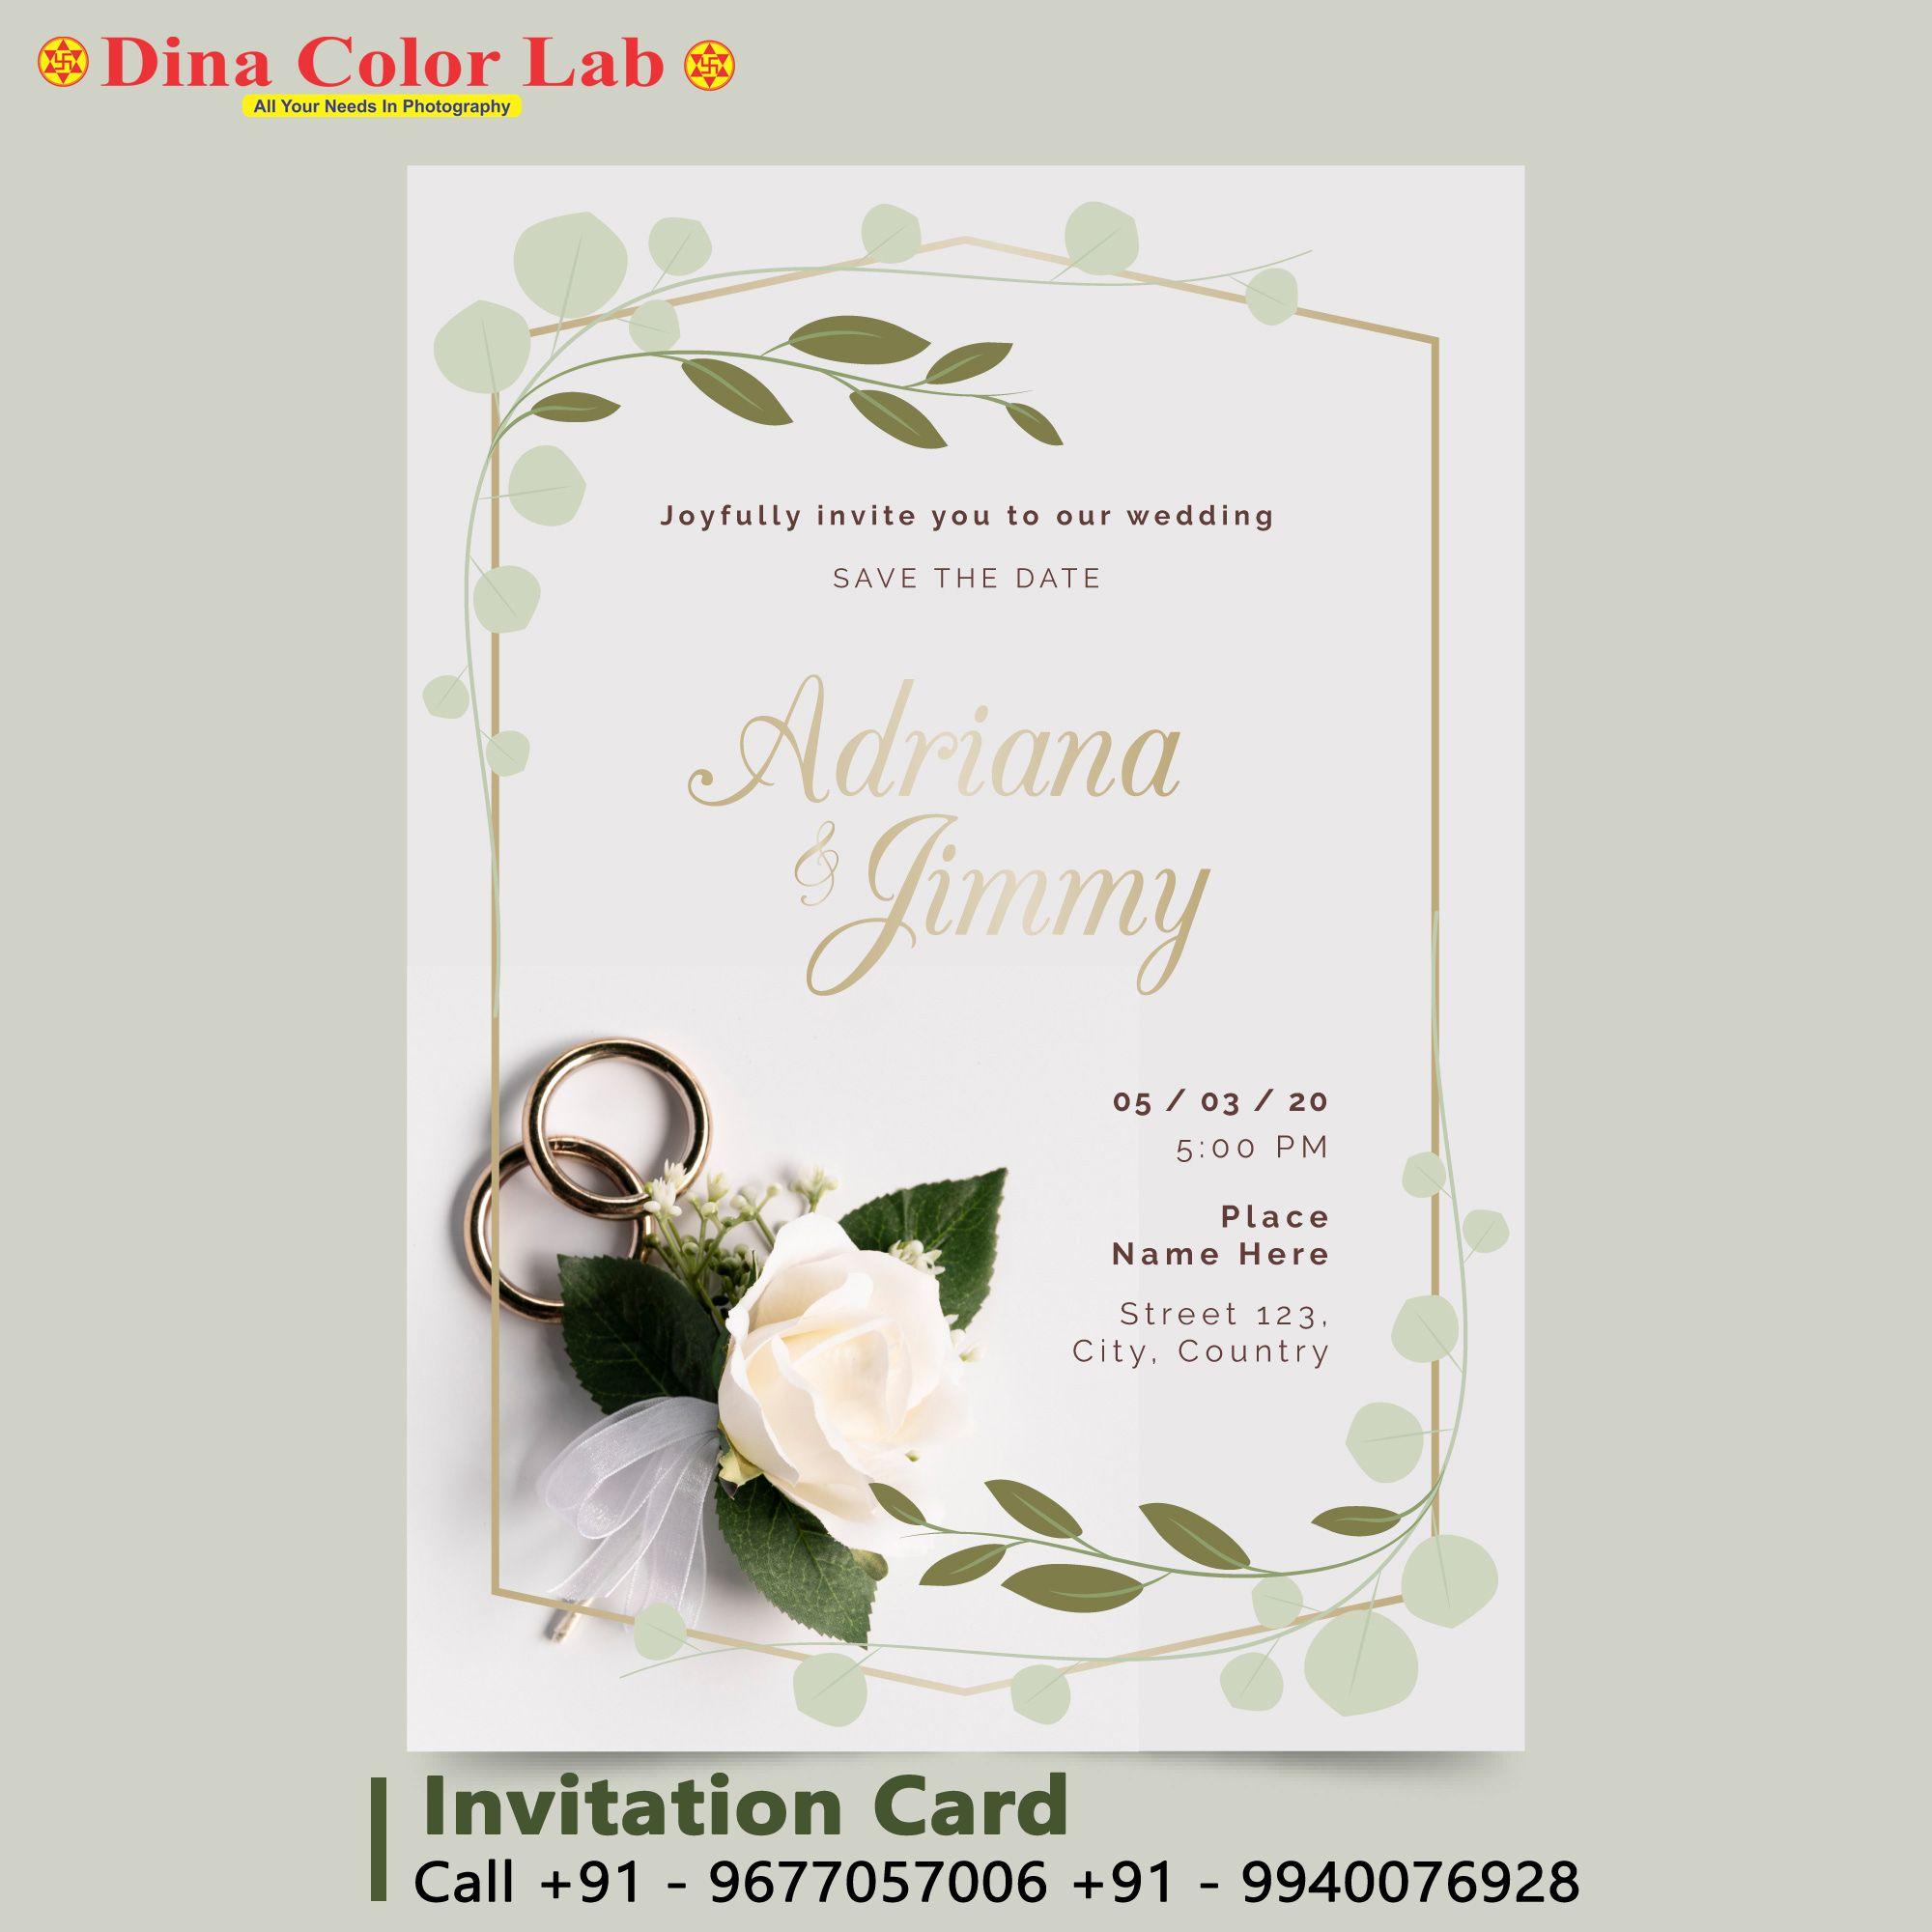 Invitation Card Printing Custom Invitation Cards Wedding Invitation Templates Wedding Invitation Card Design Invitation Card Printing